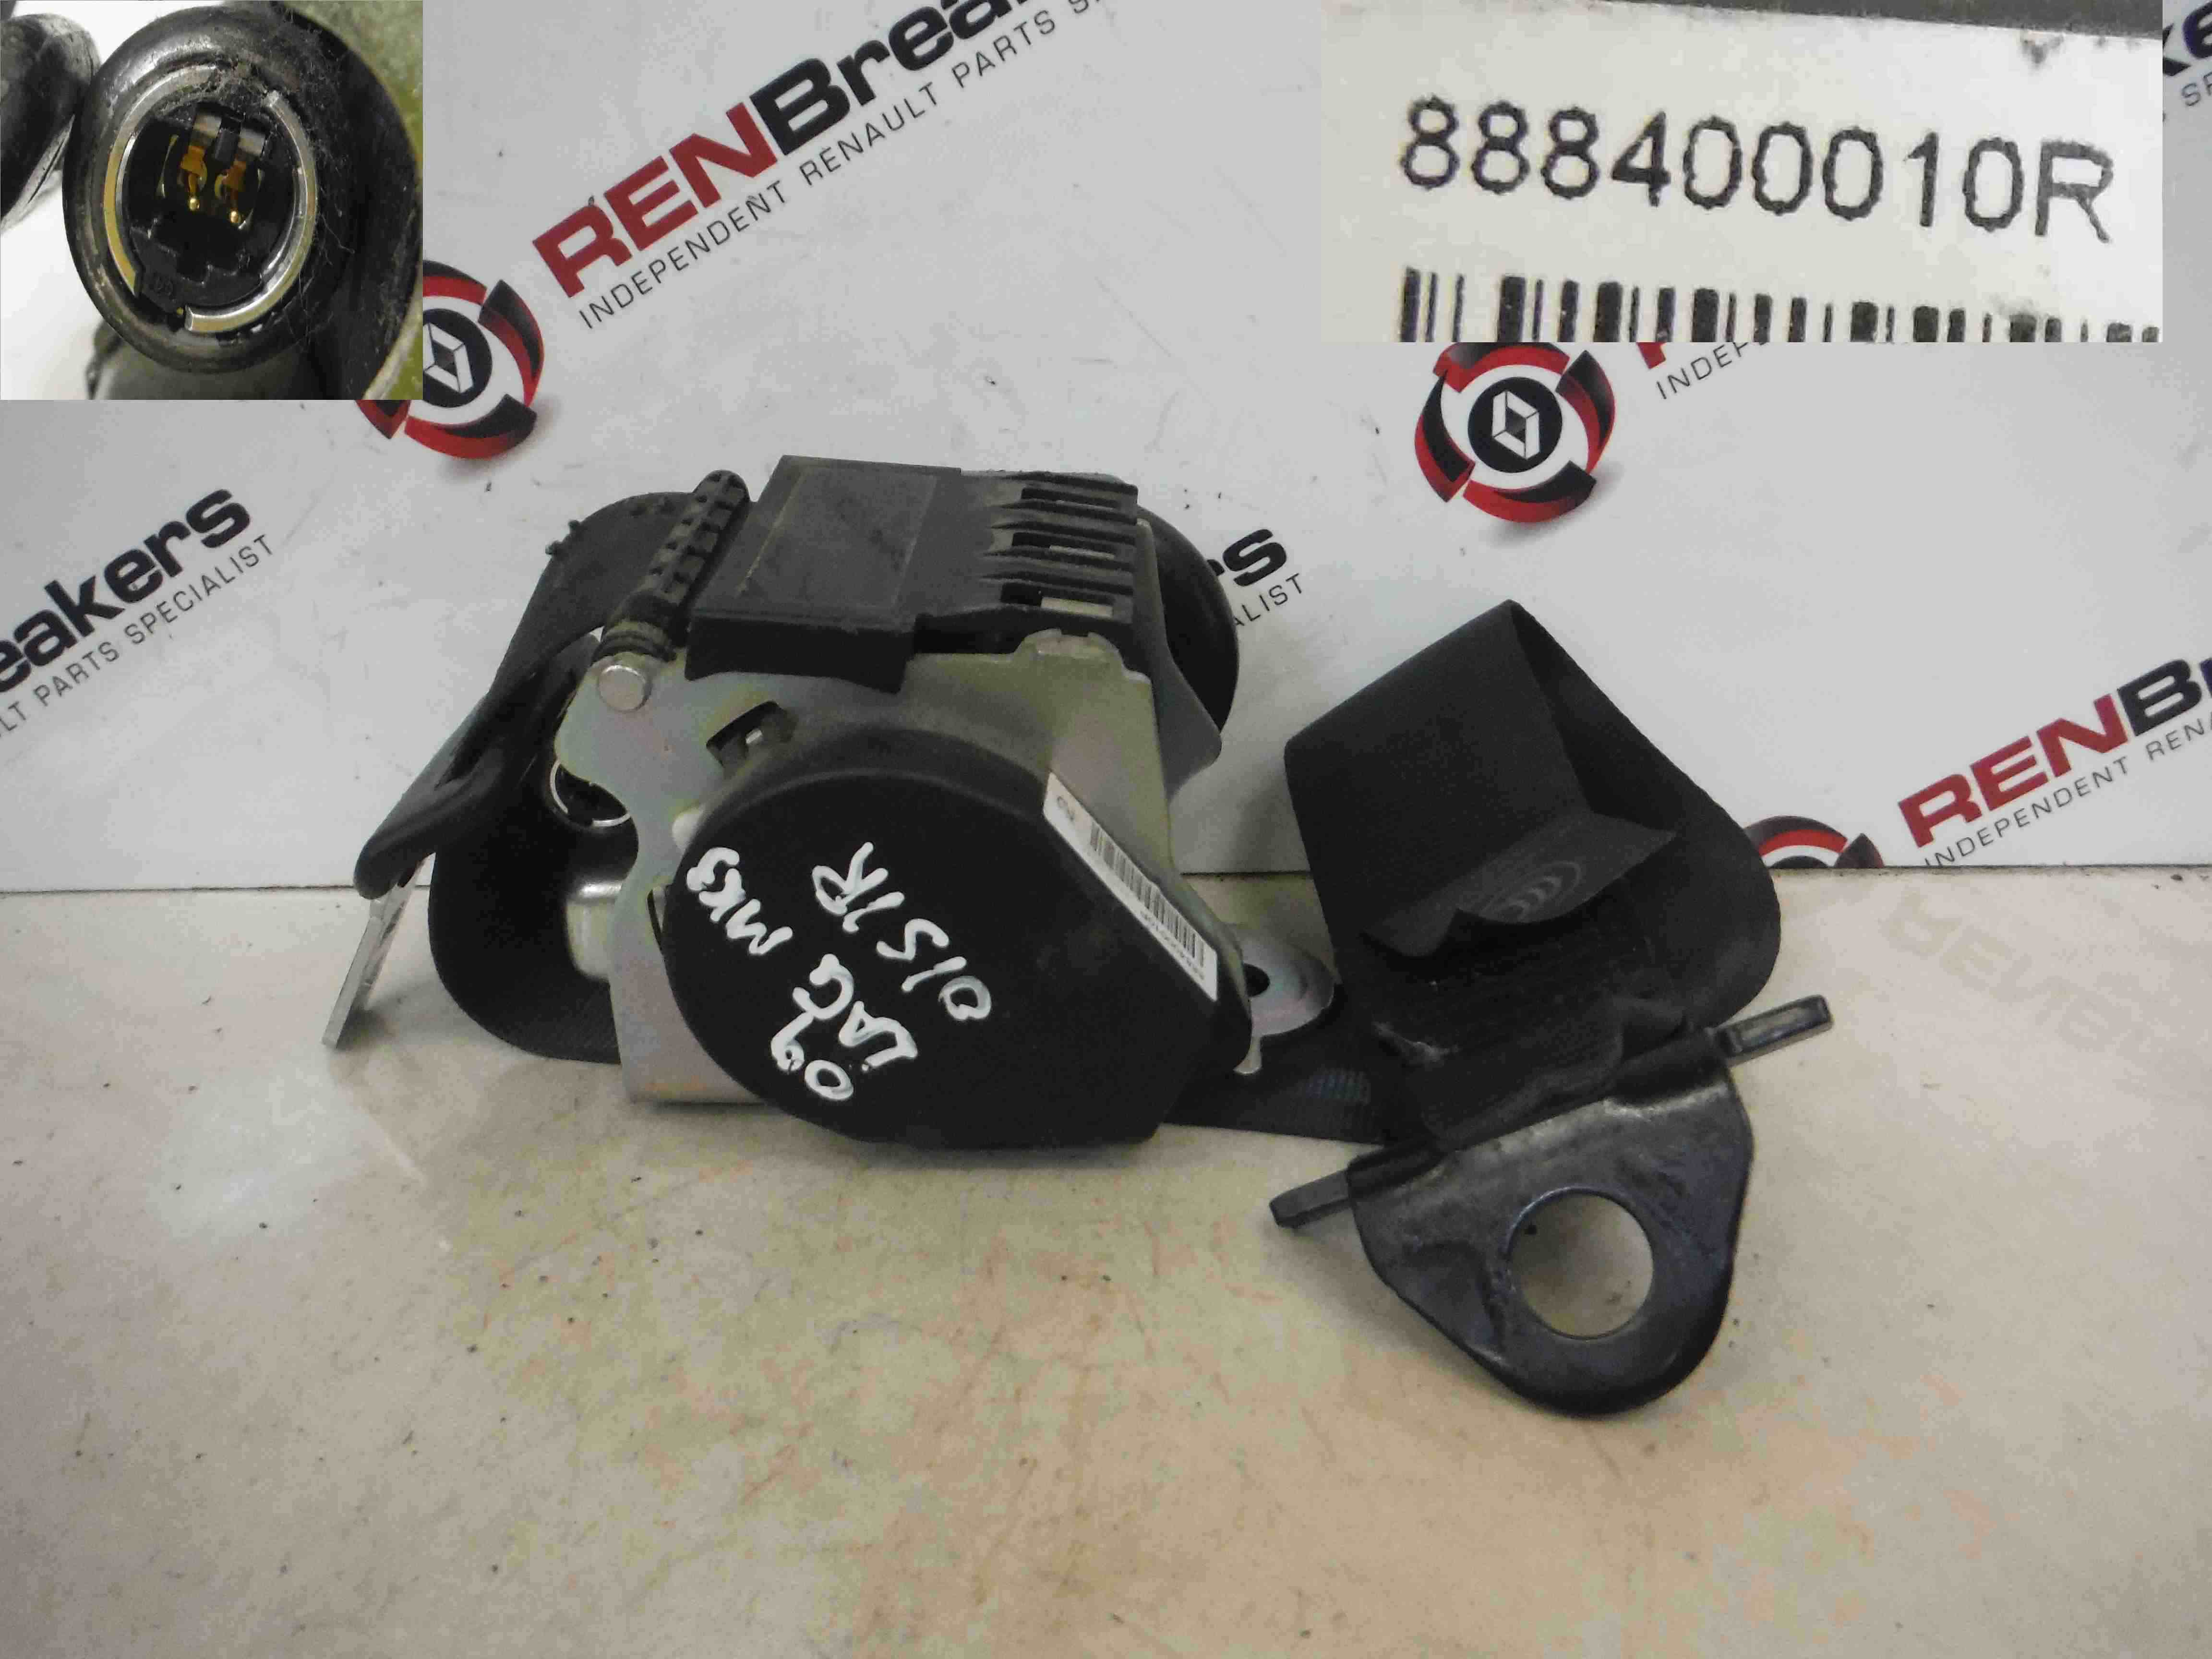 Renault Laguna Estate 2007-2012 Drivers OSR Rear Seat Belt + Pretensioner